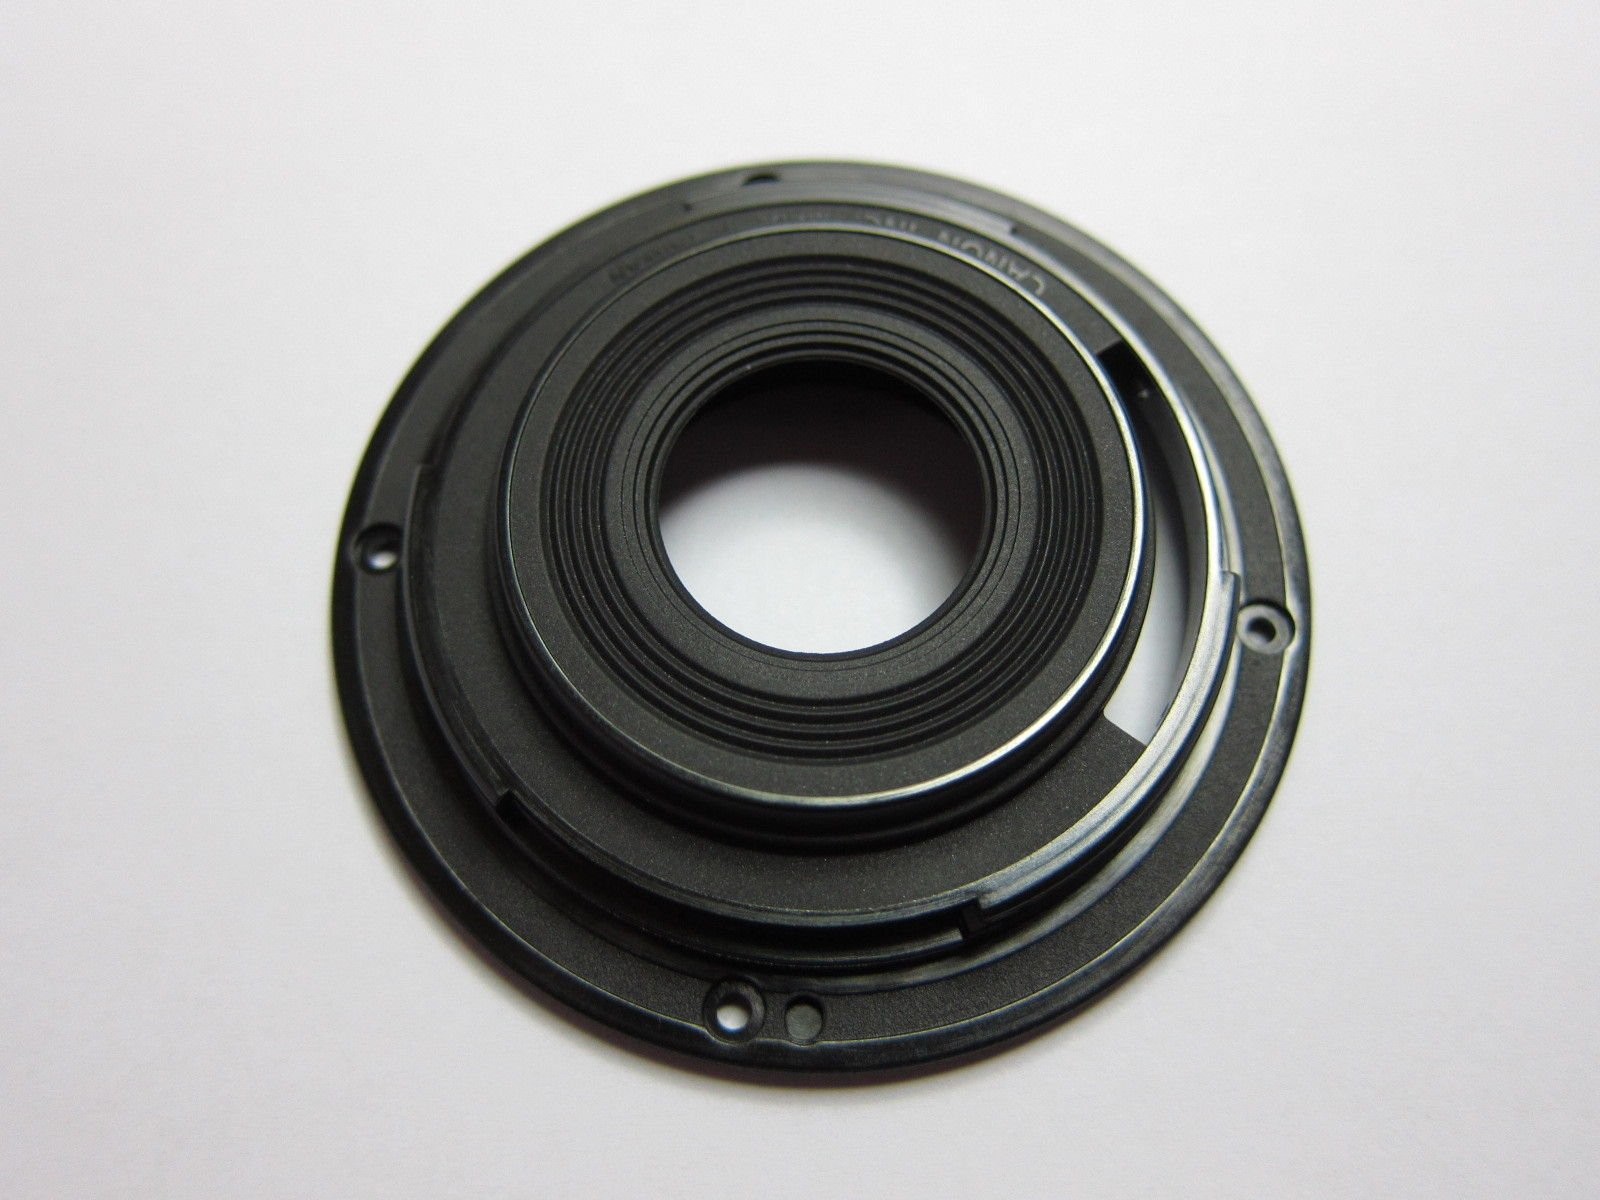 Shenligod New Lens Bayonet Mount Ring For Canon EF-S 18-55mm F3.5-5.6 IS STM lens camera Repair Part by Shenligod